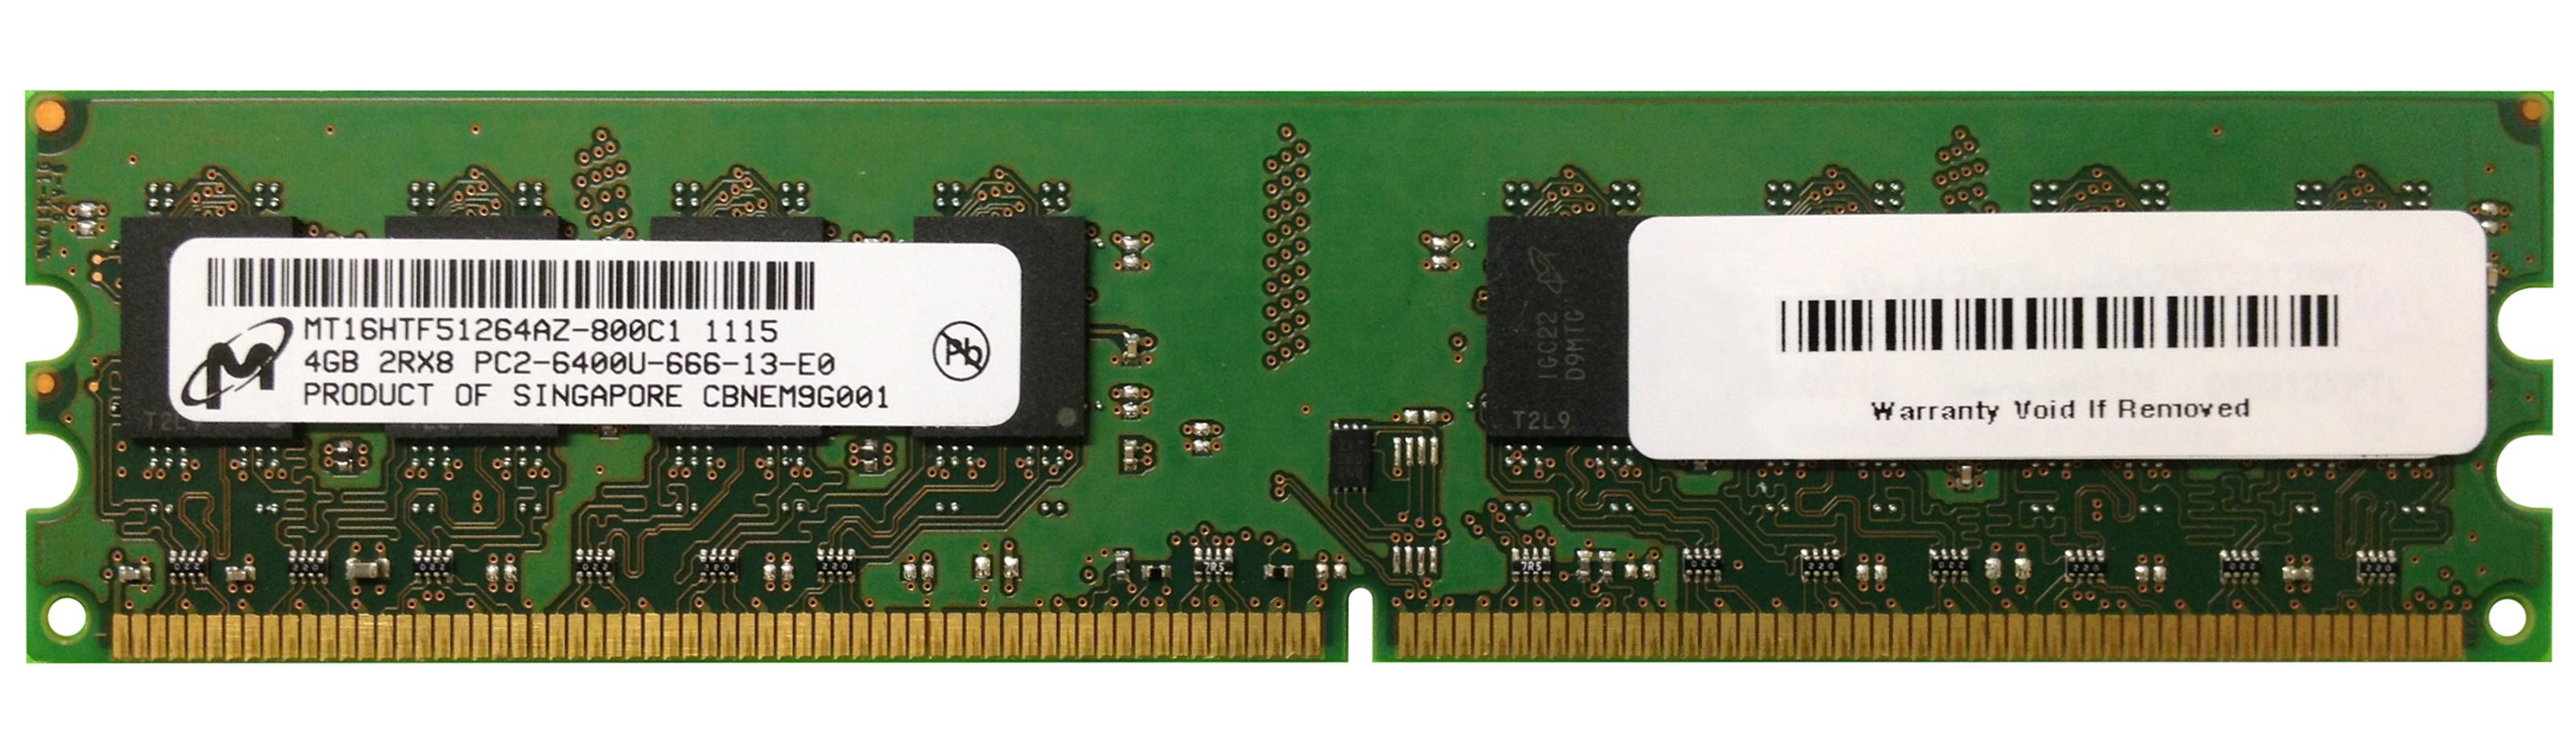 M4L Certified 4GB 800MHz DDR2 PC2-6400 Non-ECC CL6 240-Pin Dual Rank x8 DIMM Mfr P/N M4L-PC2800D2N6-4G